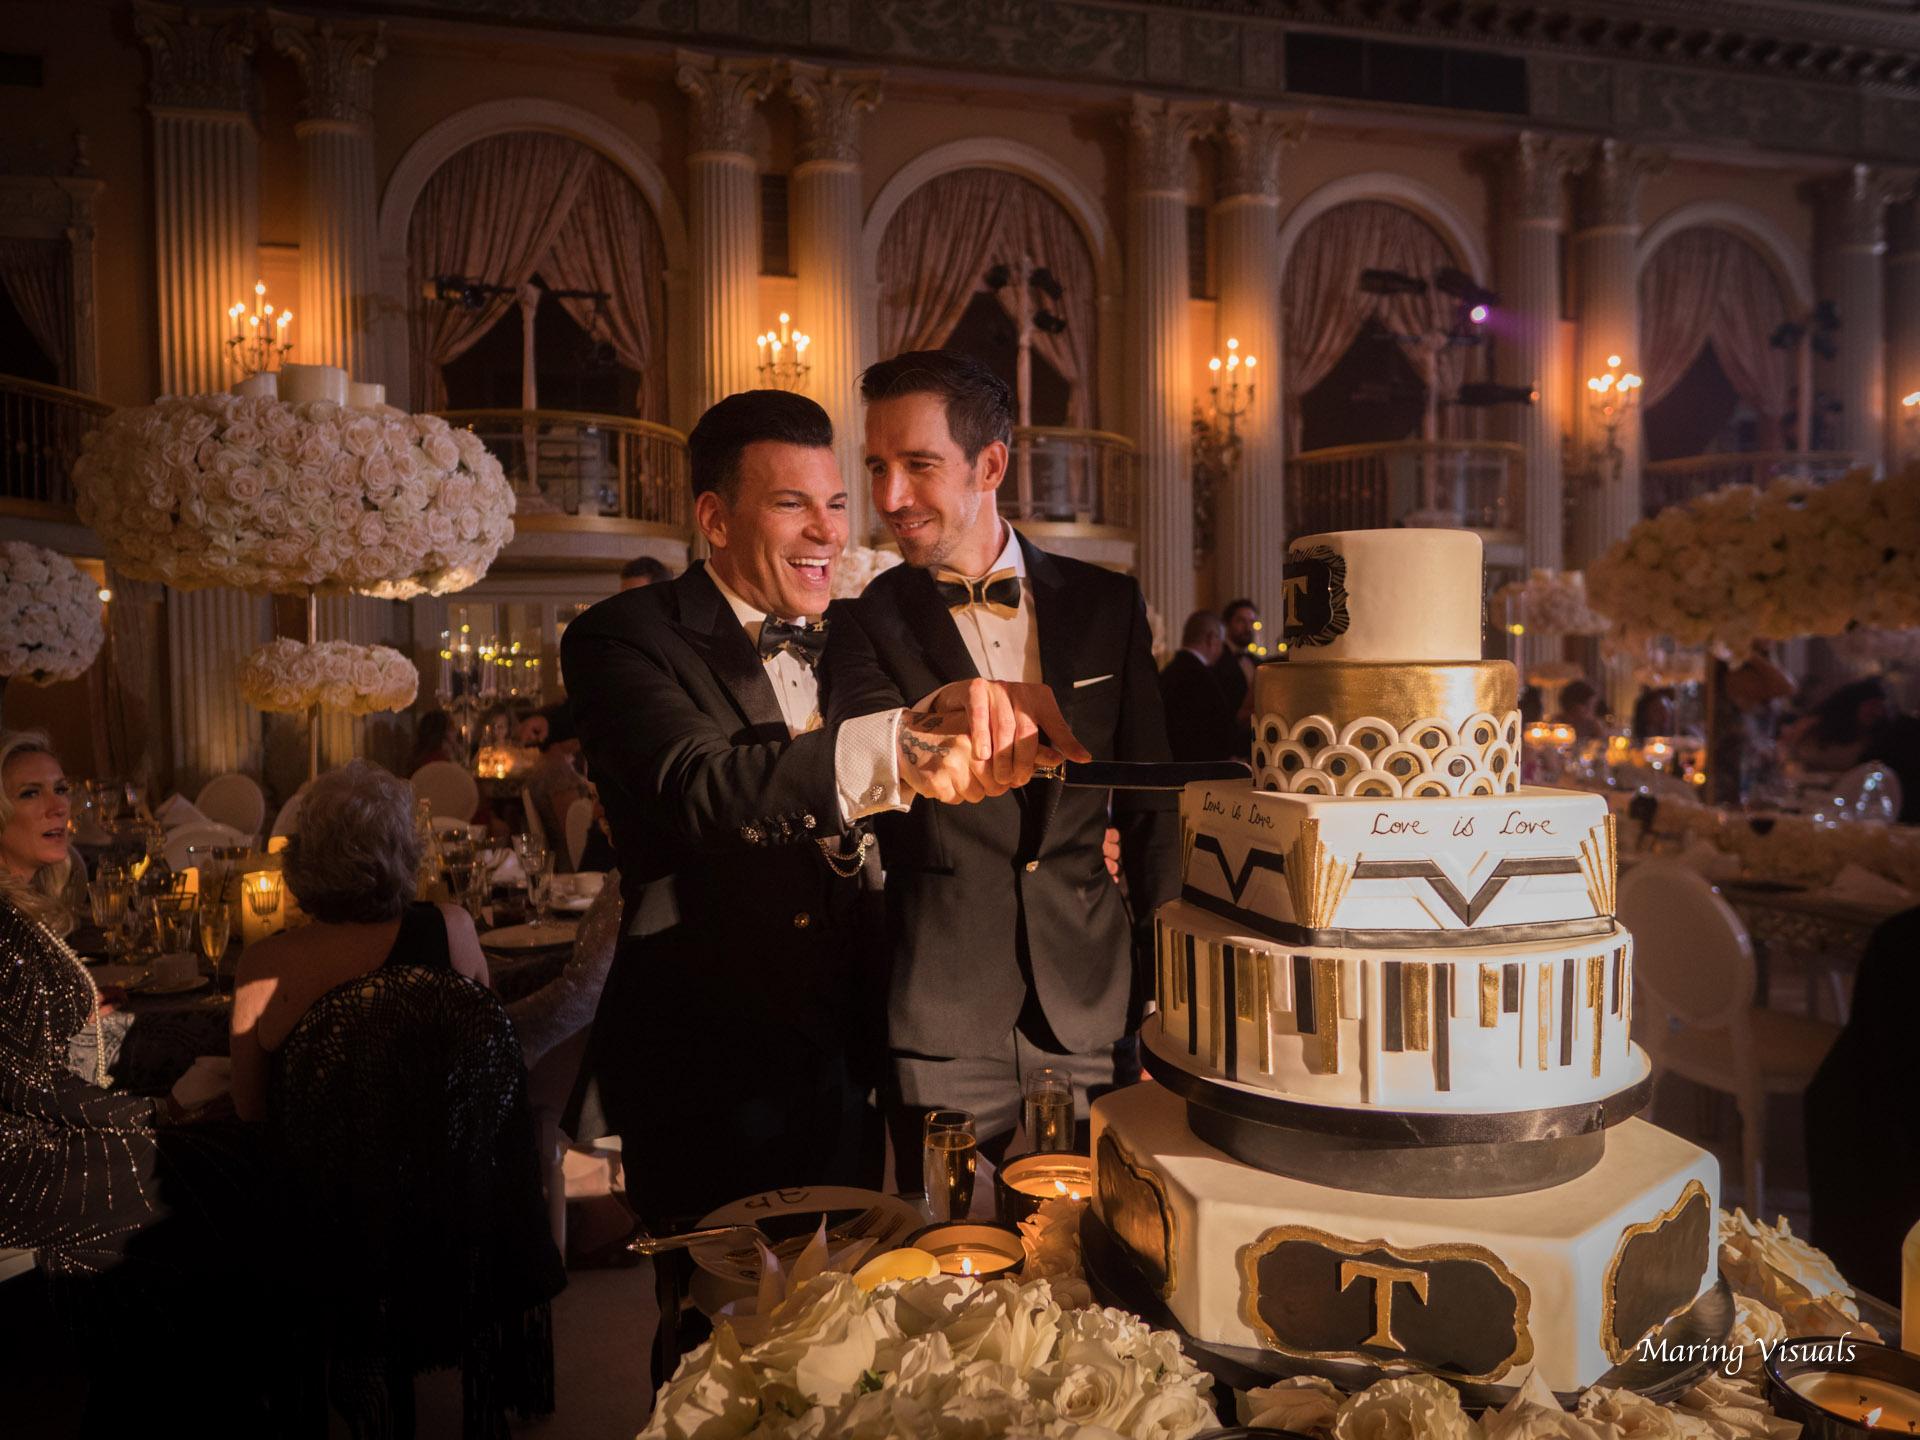 David Tutera Weddings by Maring Visuals 00576.jpg